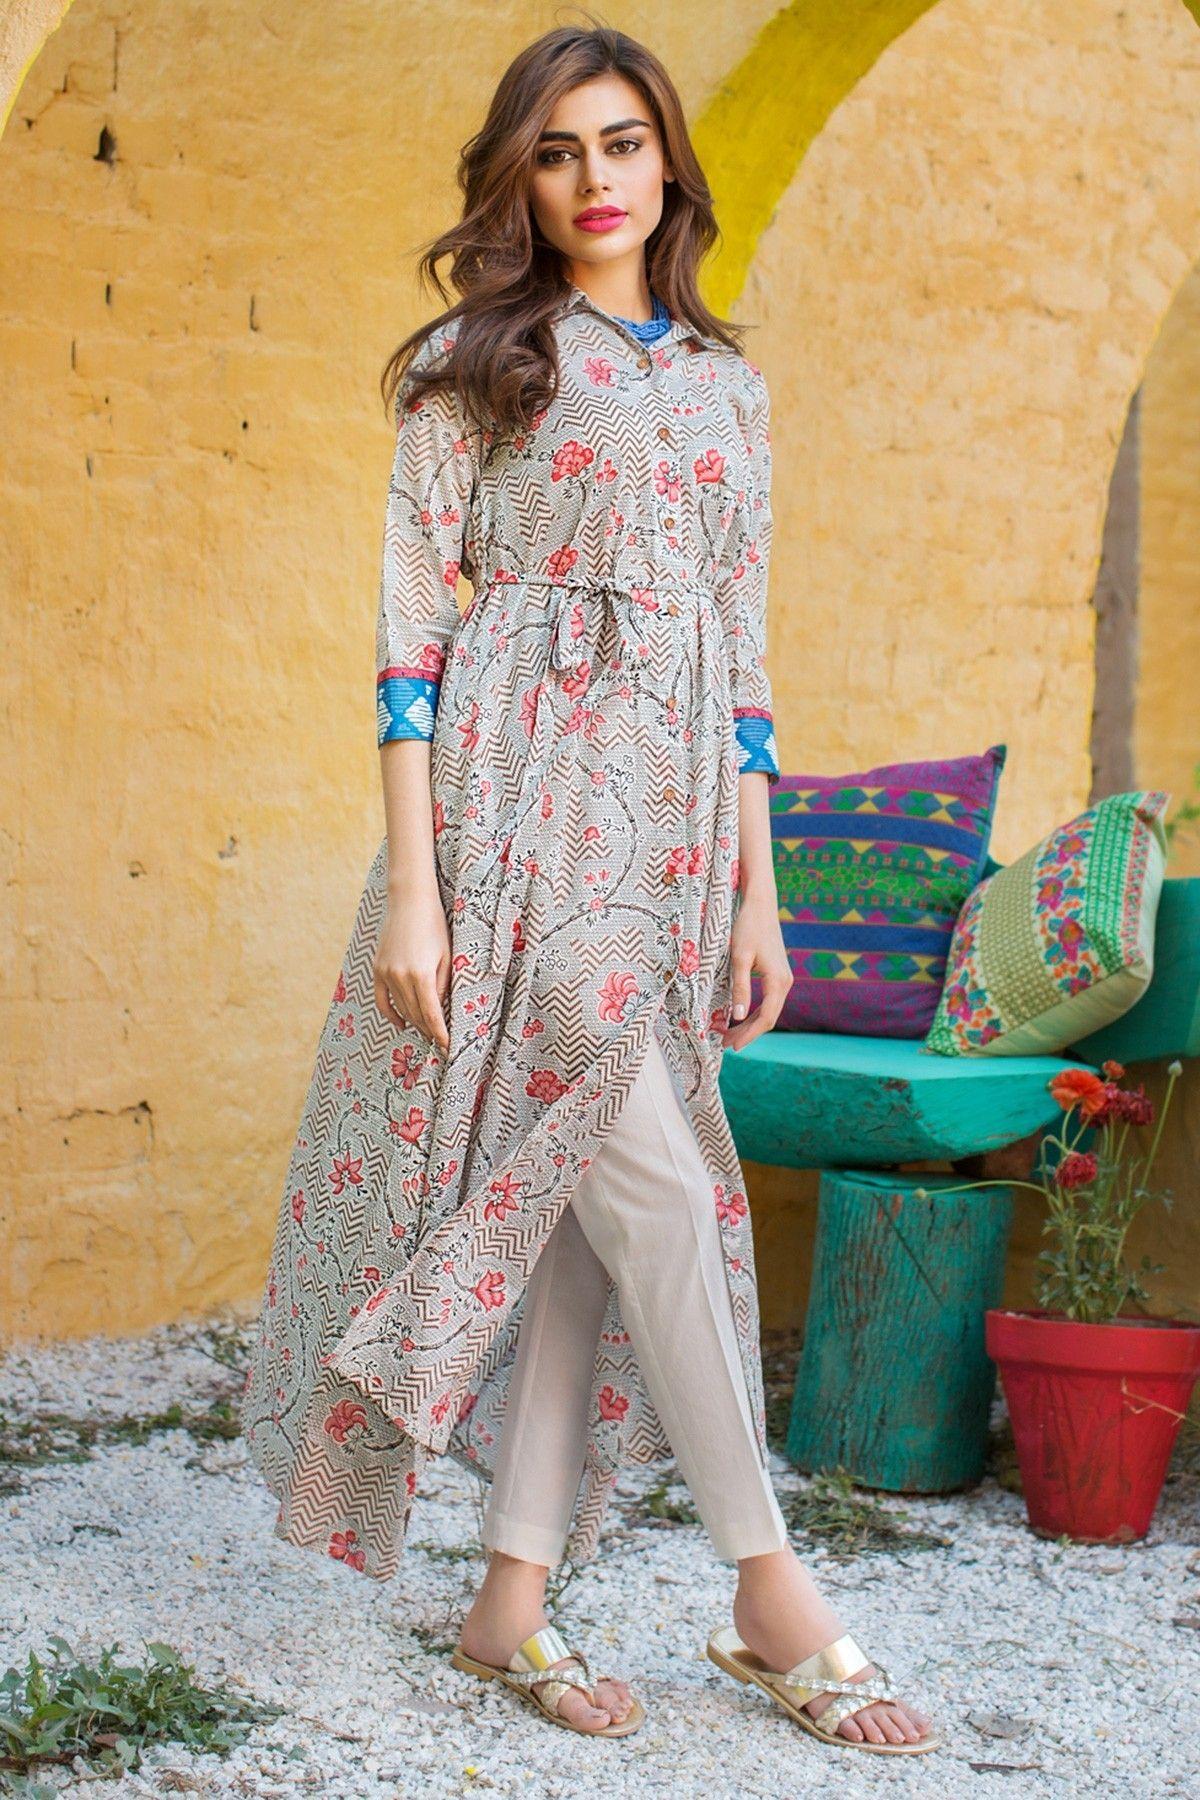 Pin de Saira en Fashion Dresses   Pinterest   Hindus y Tacones